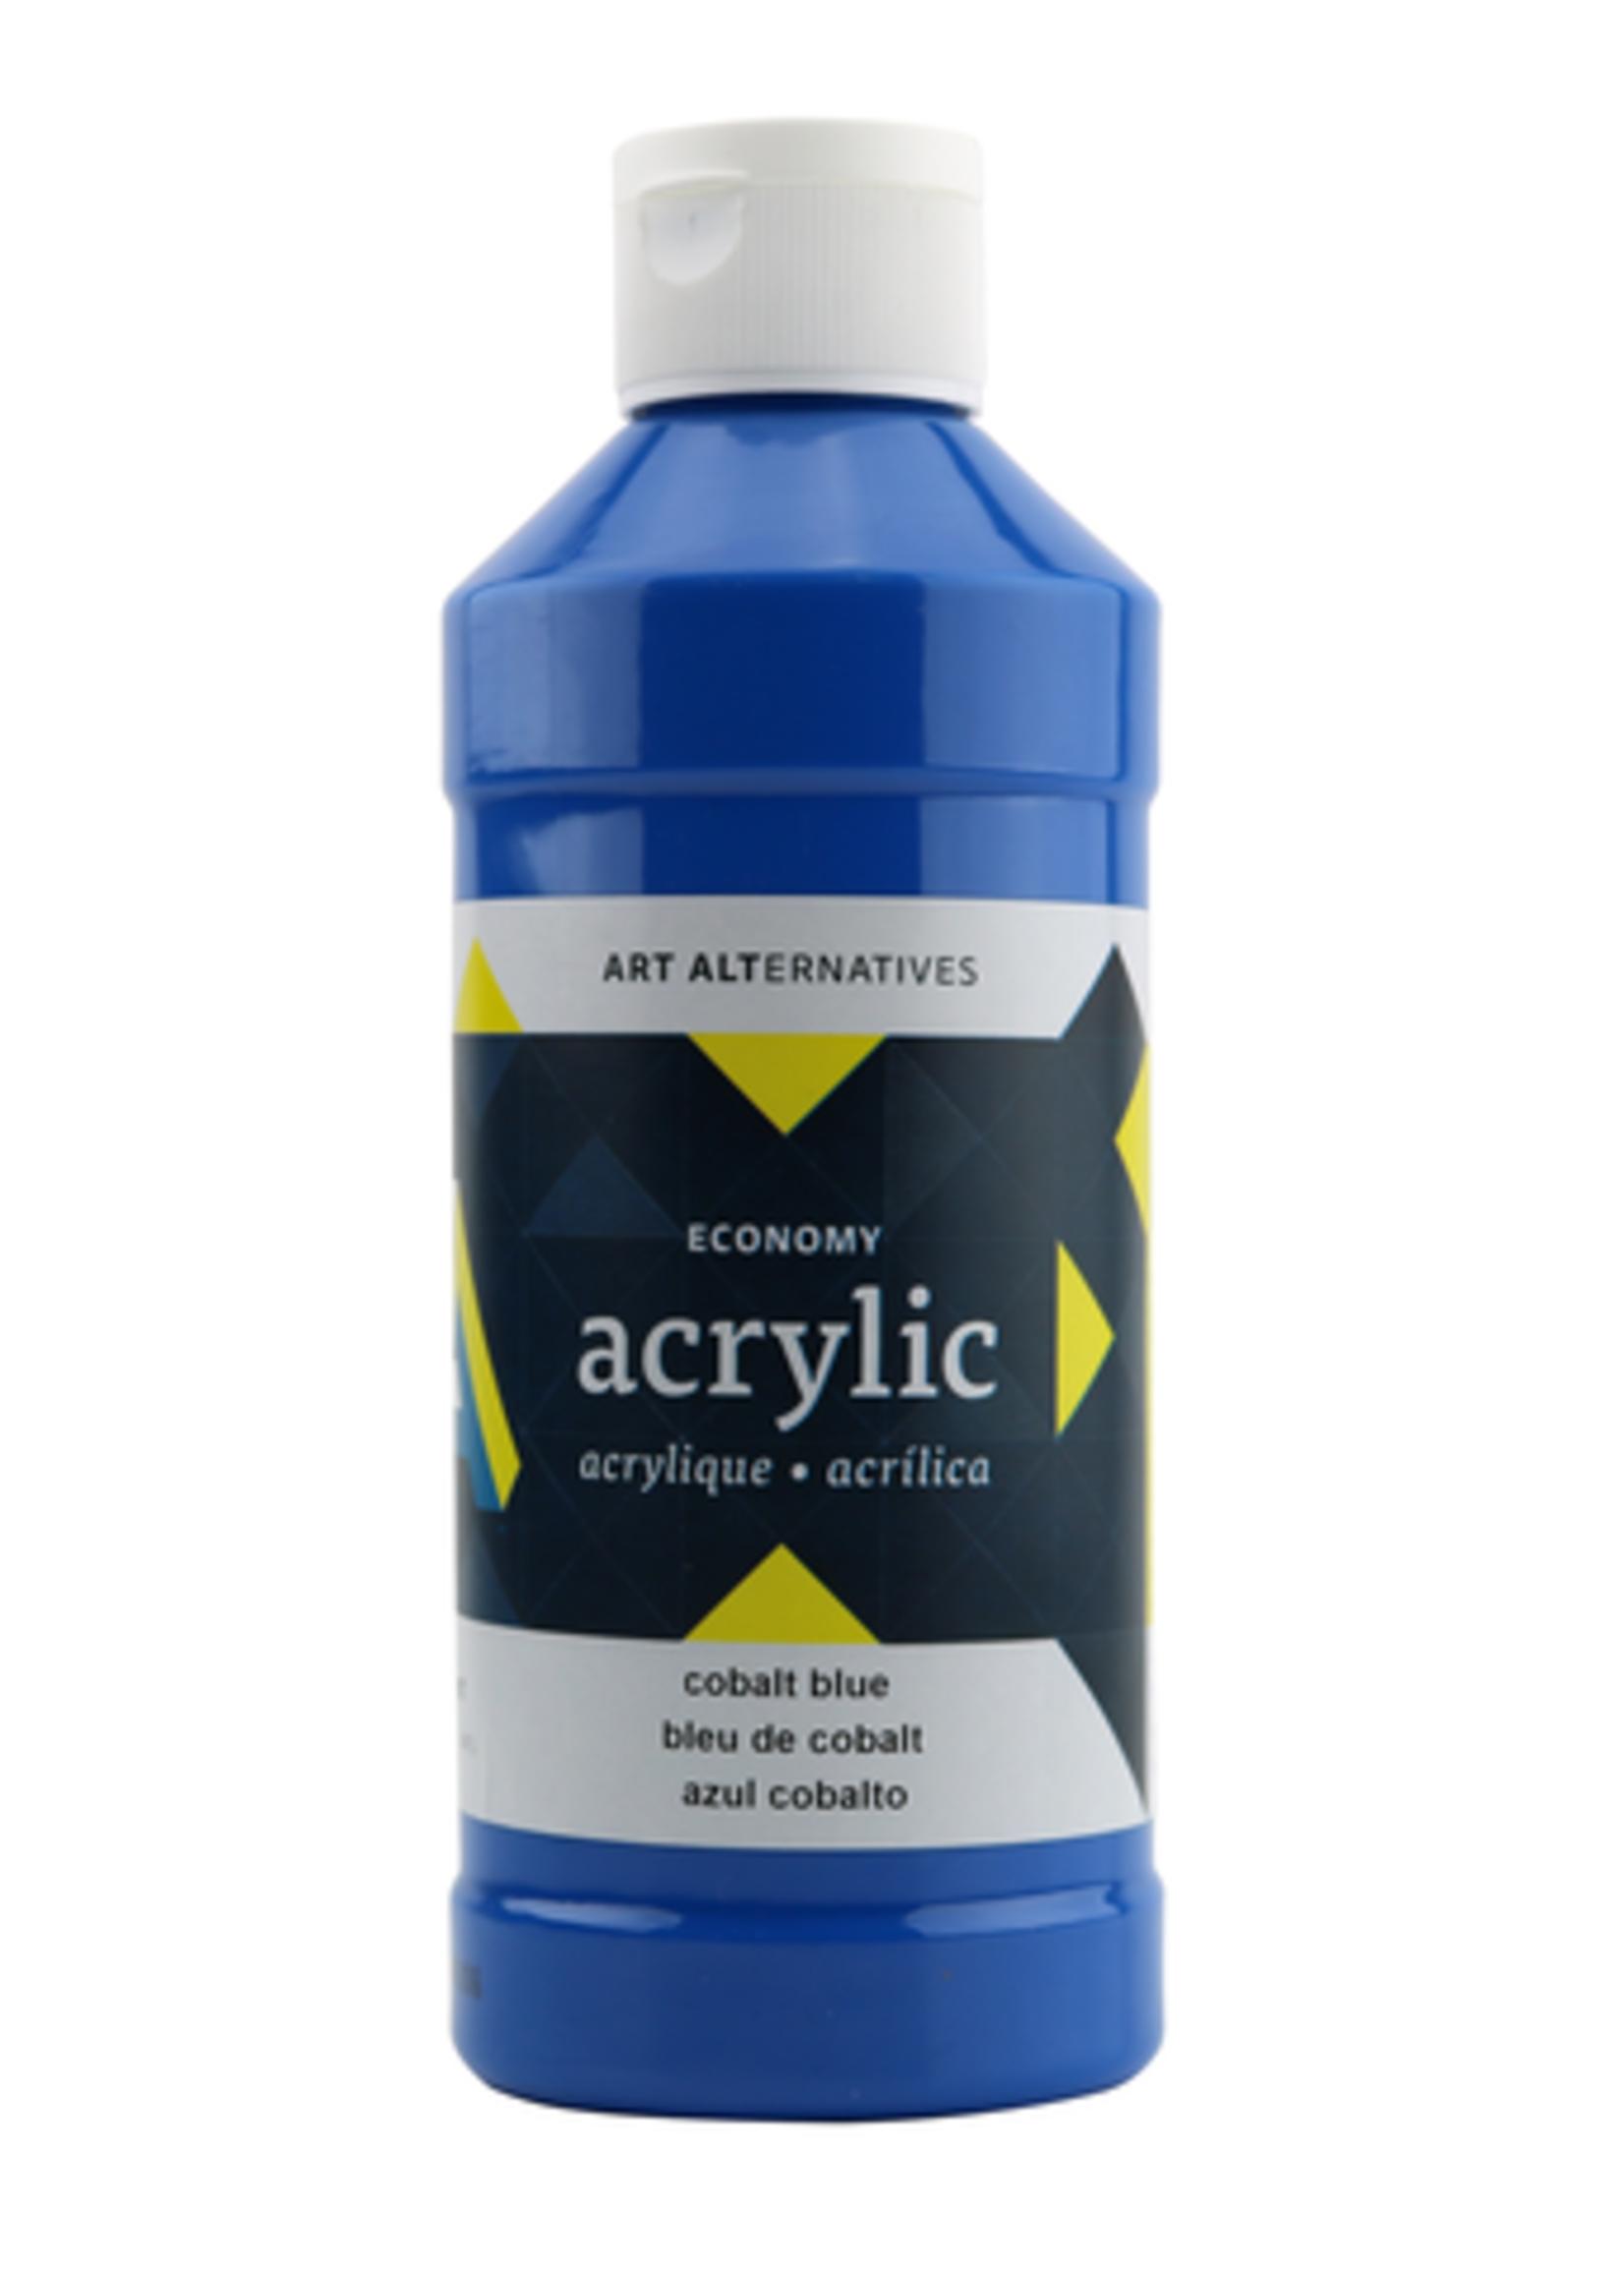 ART ALTERNATIVES AA STUDENT ACRYLIC PAINT